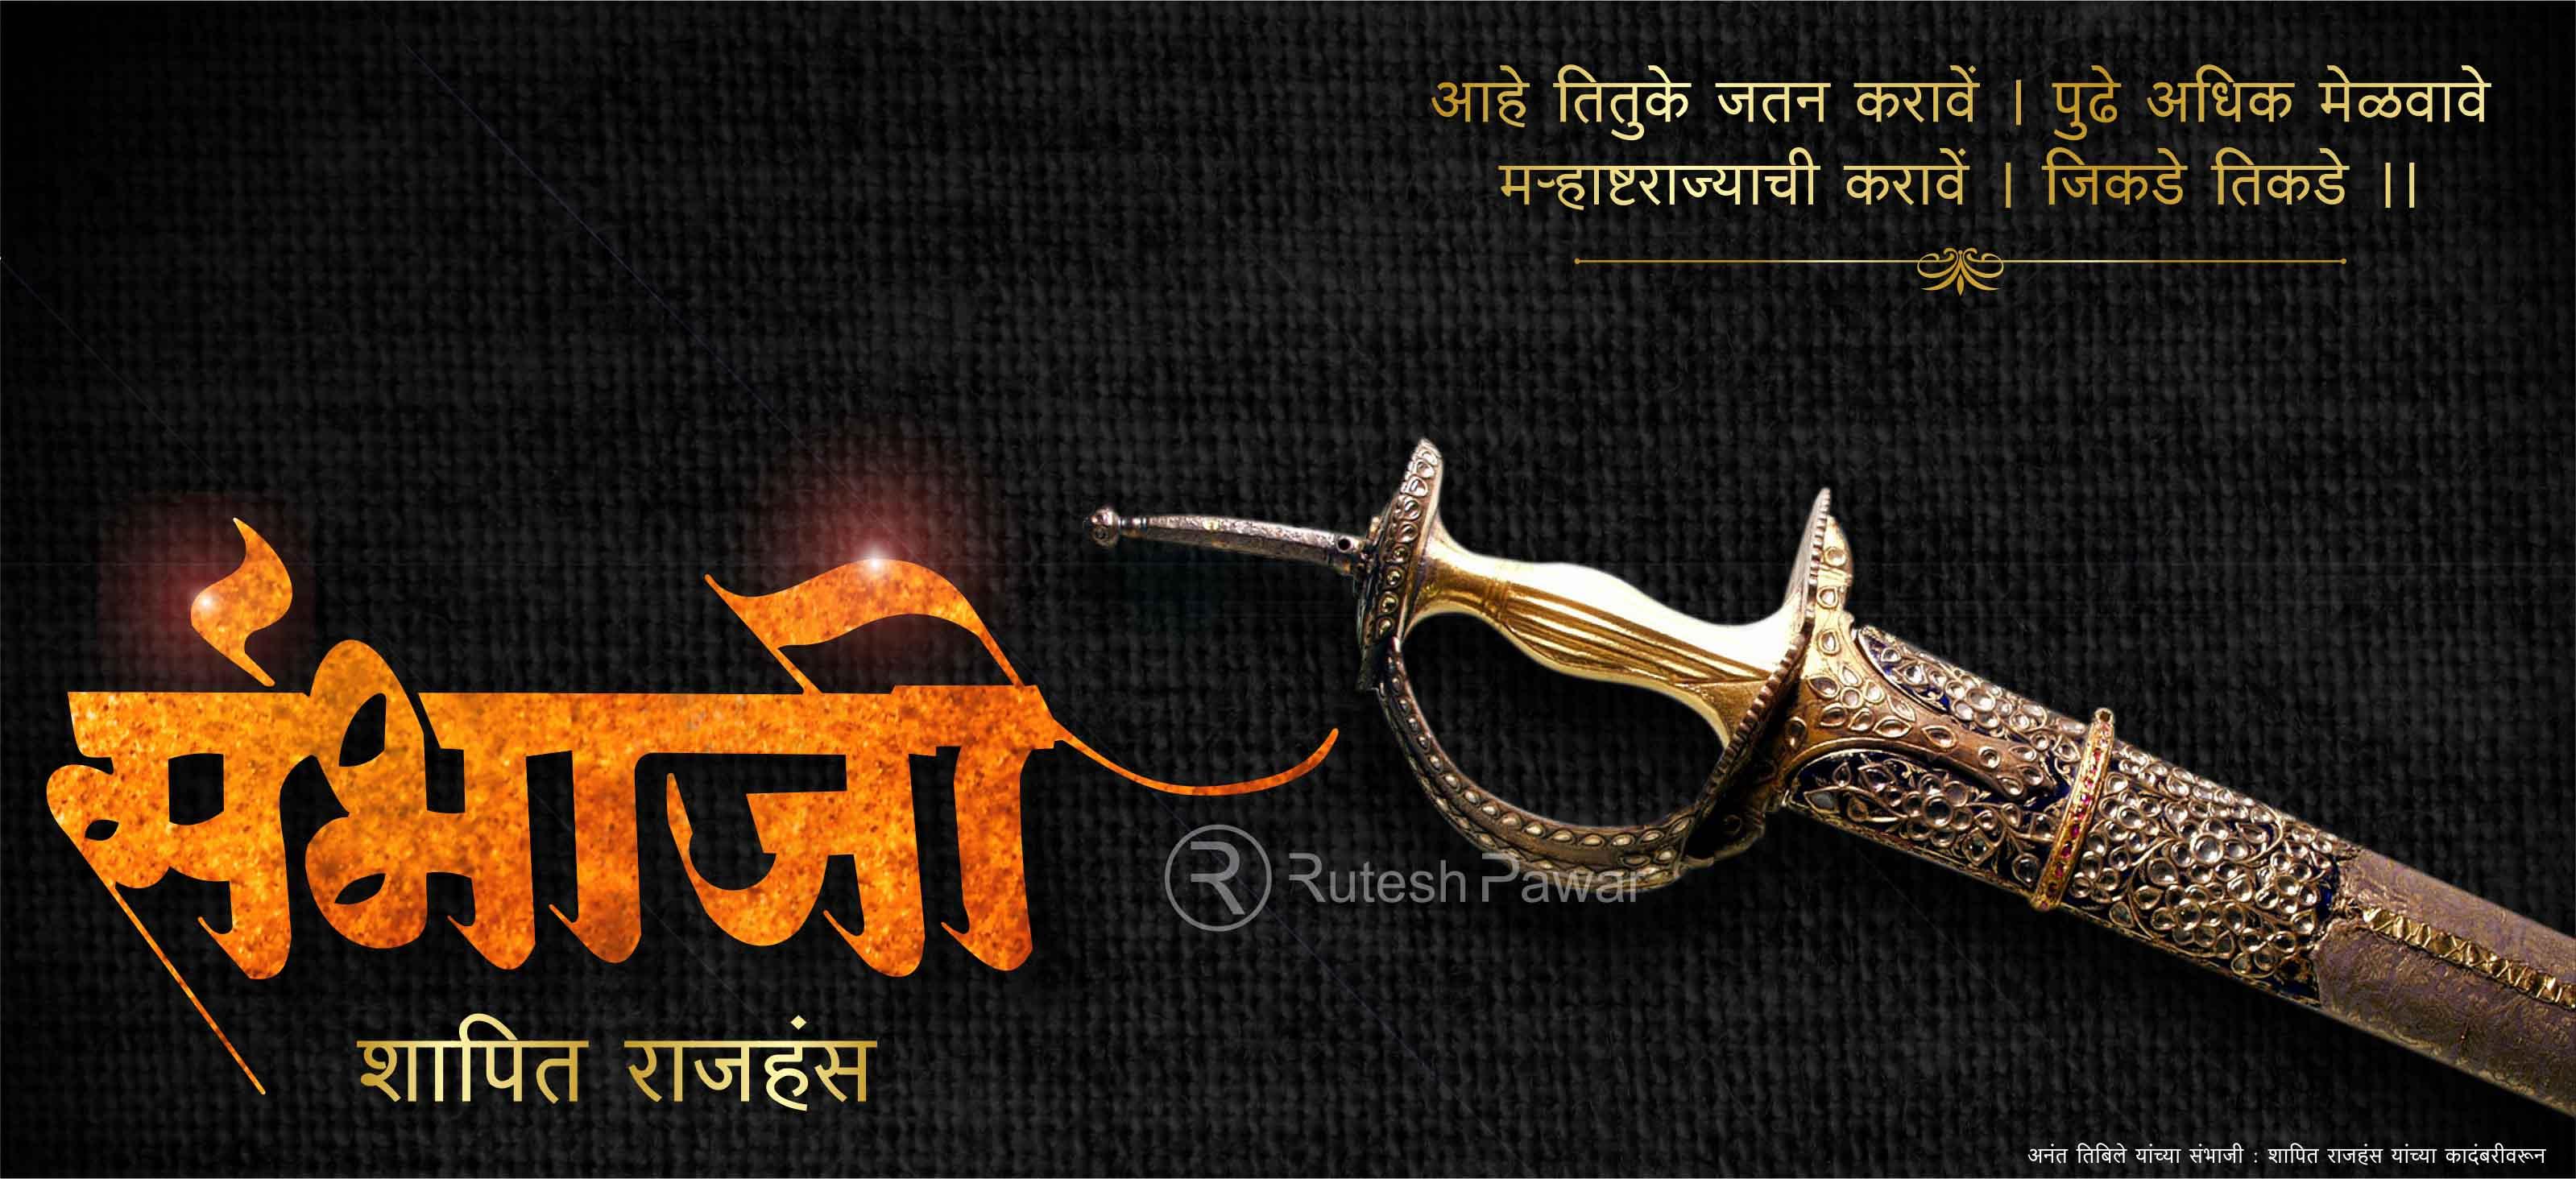 sambhaji maharaj by ruteshpawar on deviantart